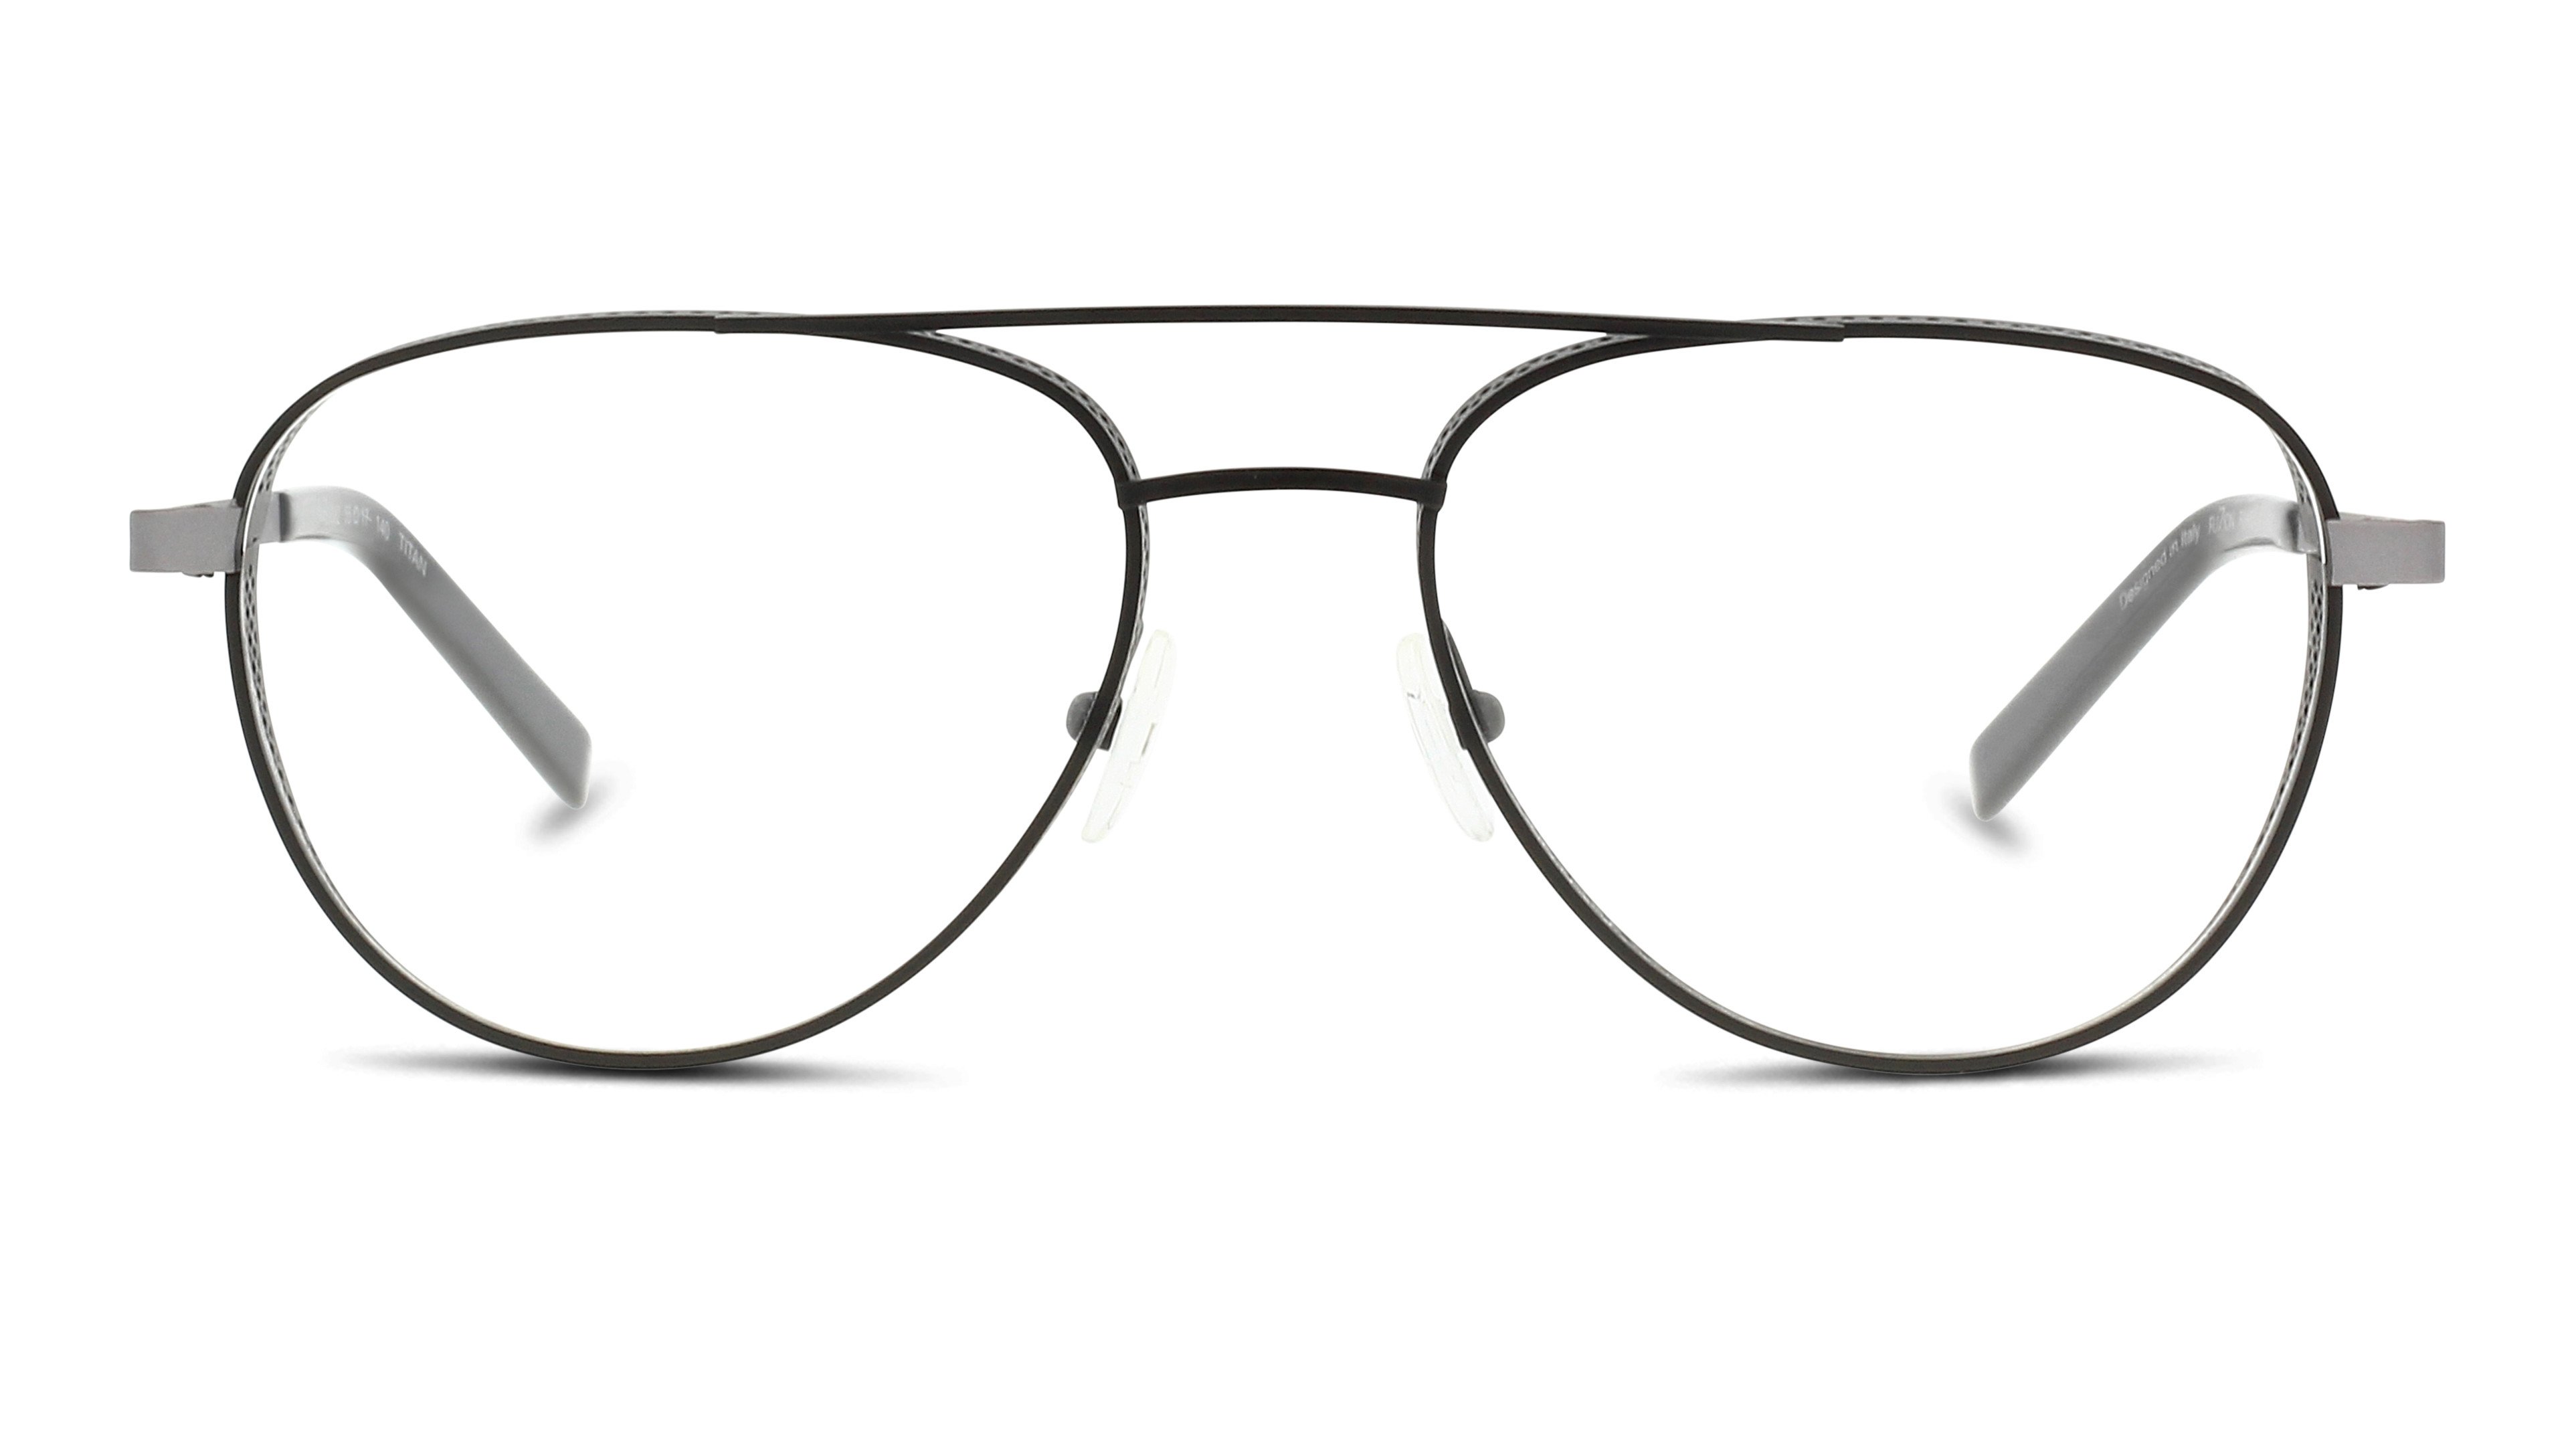 8719154621642-front-01-fuzion-fuim01-Eyewear-black-grey